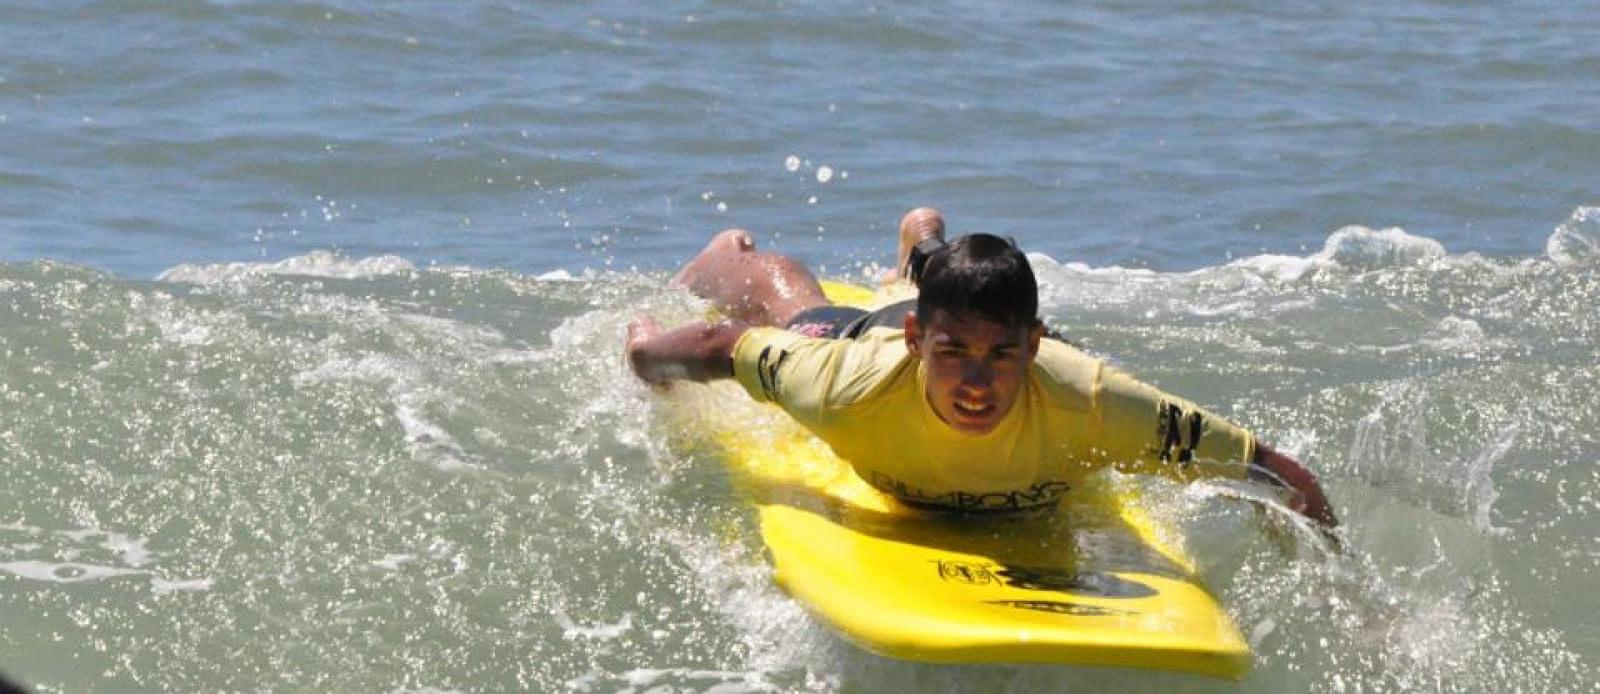 Ecole surf- Boco - Lacanau - surfeur